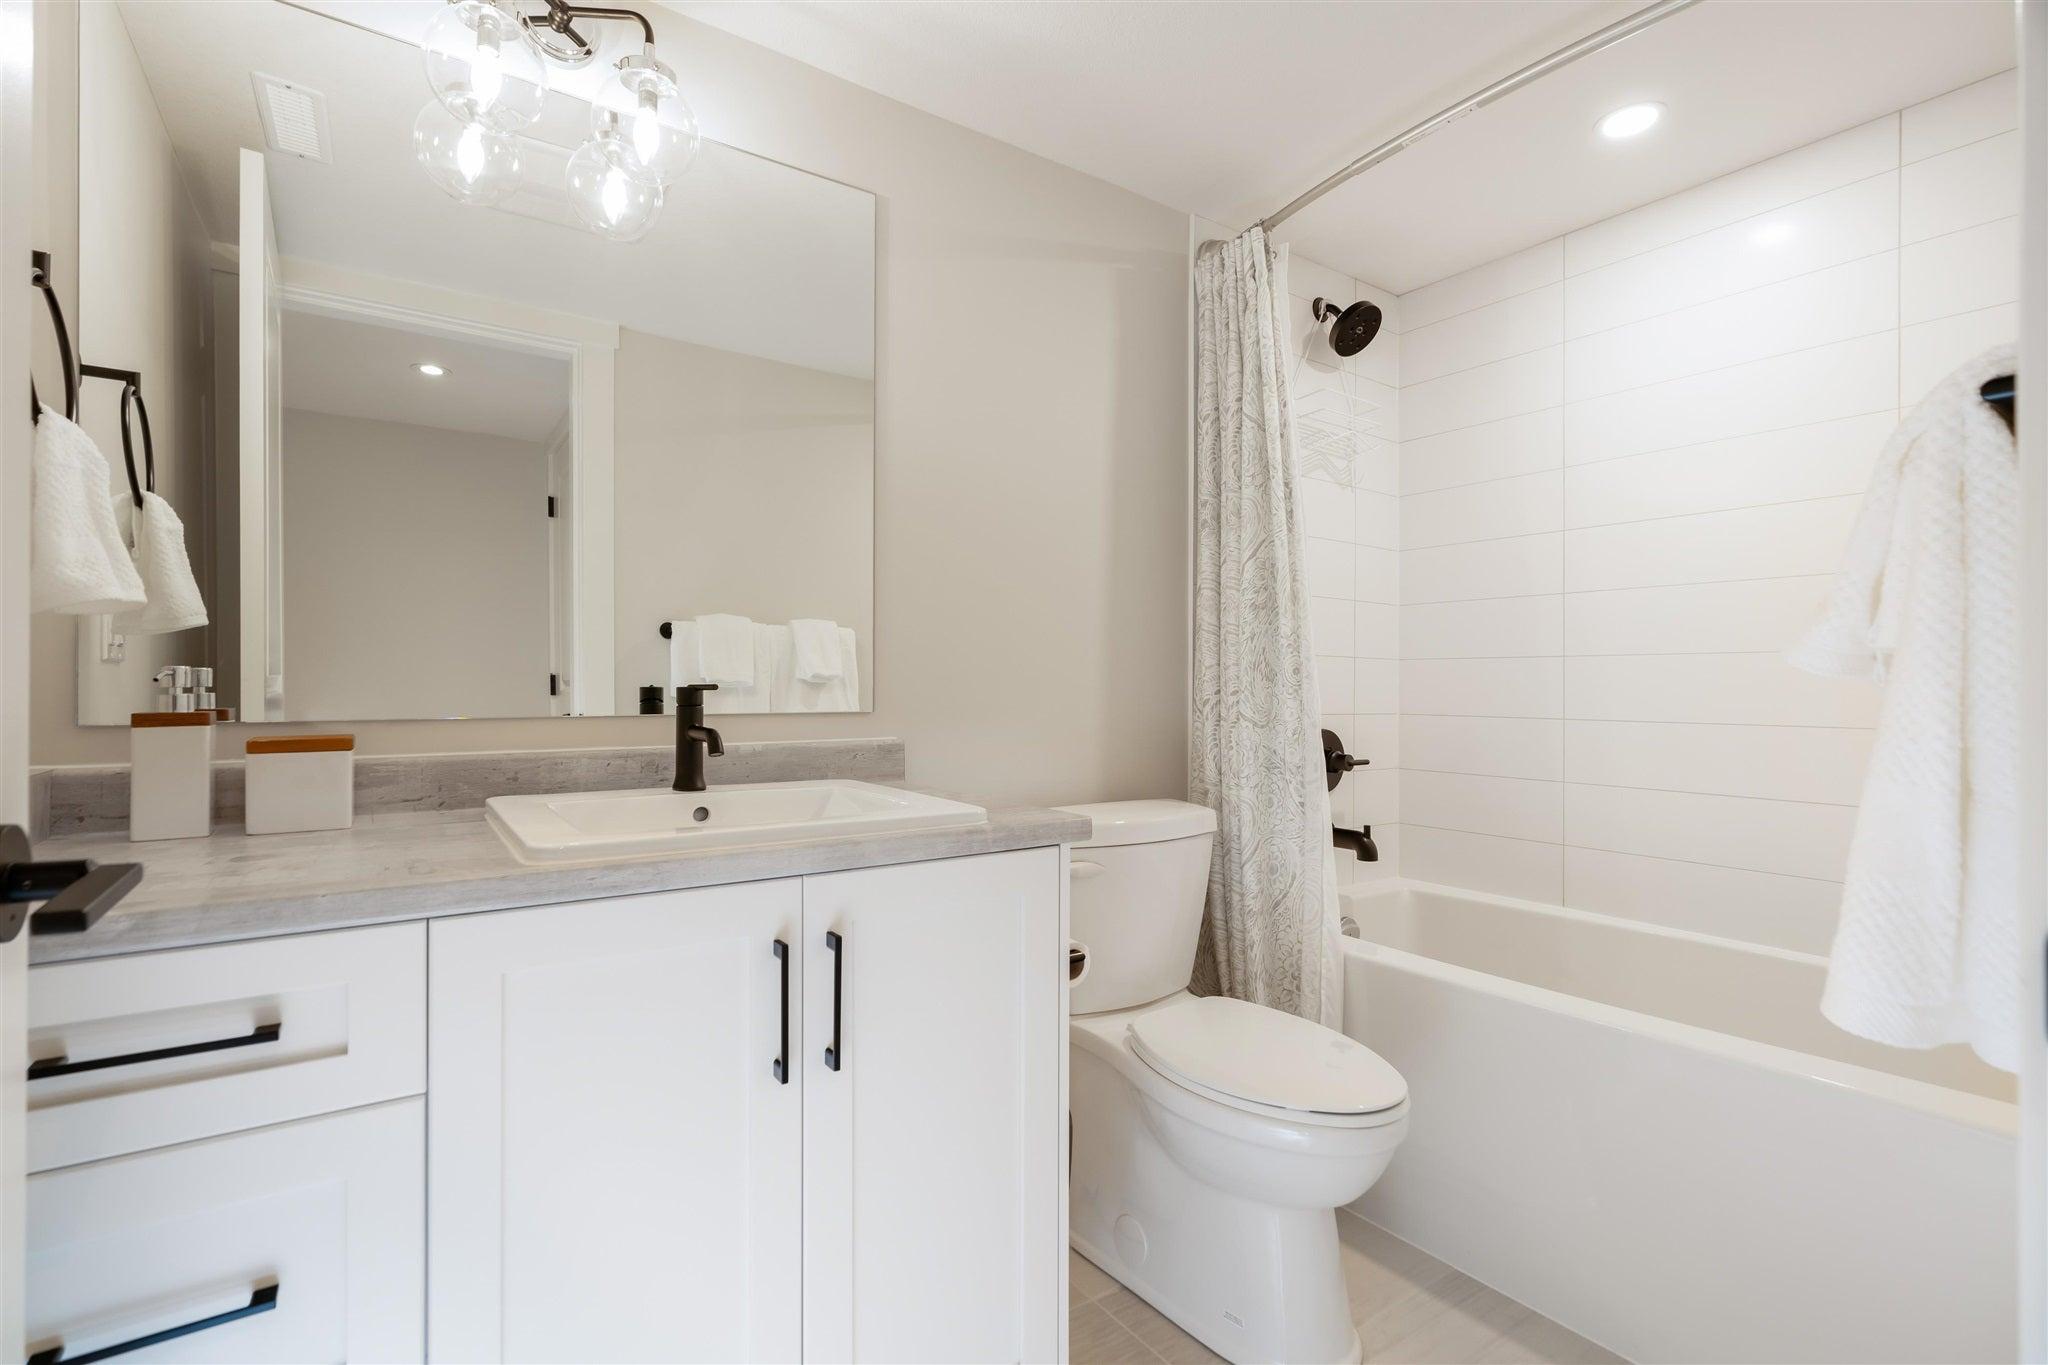 40 21858 47B AVENUE - Murrayville Townhouse for sale, 4 Bedrooms (R2603956) - #30